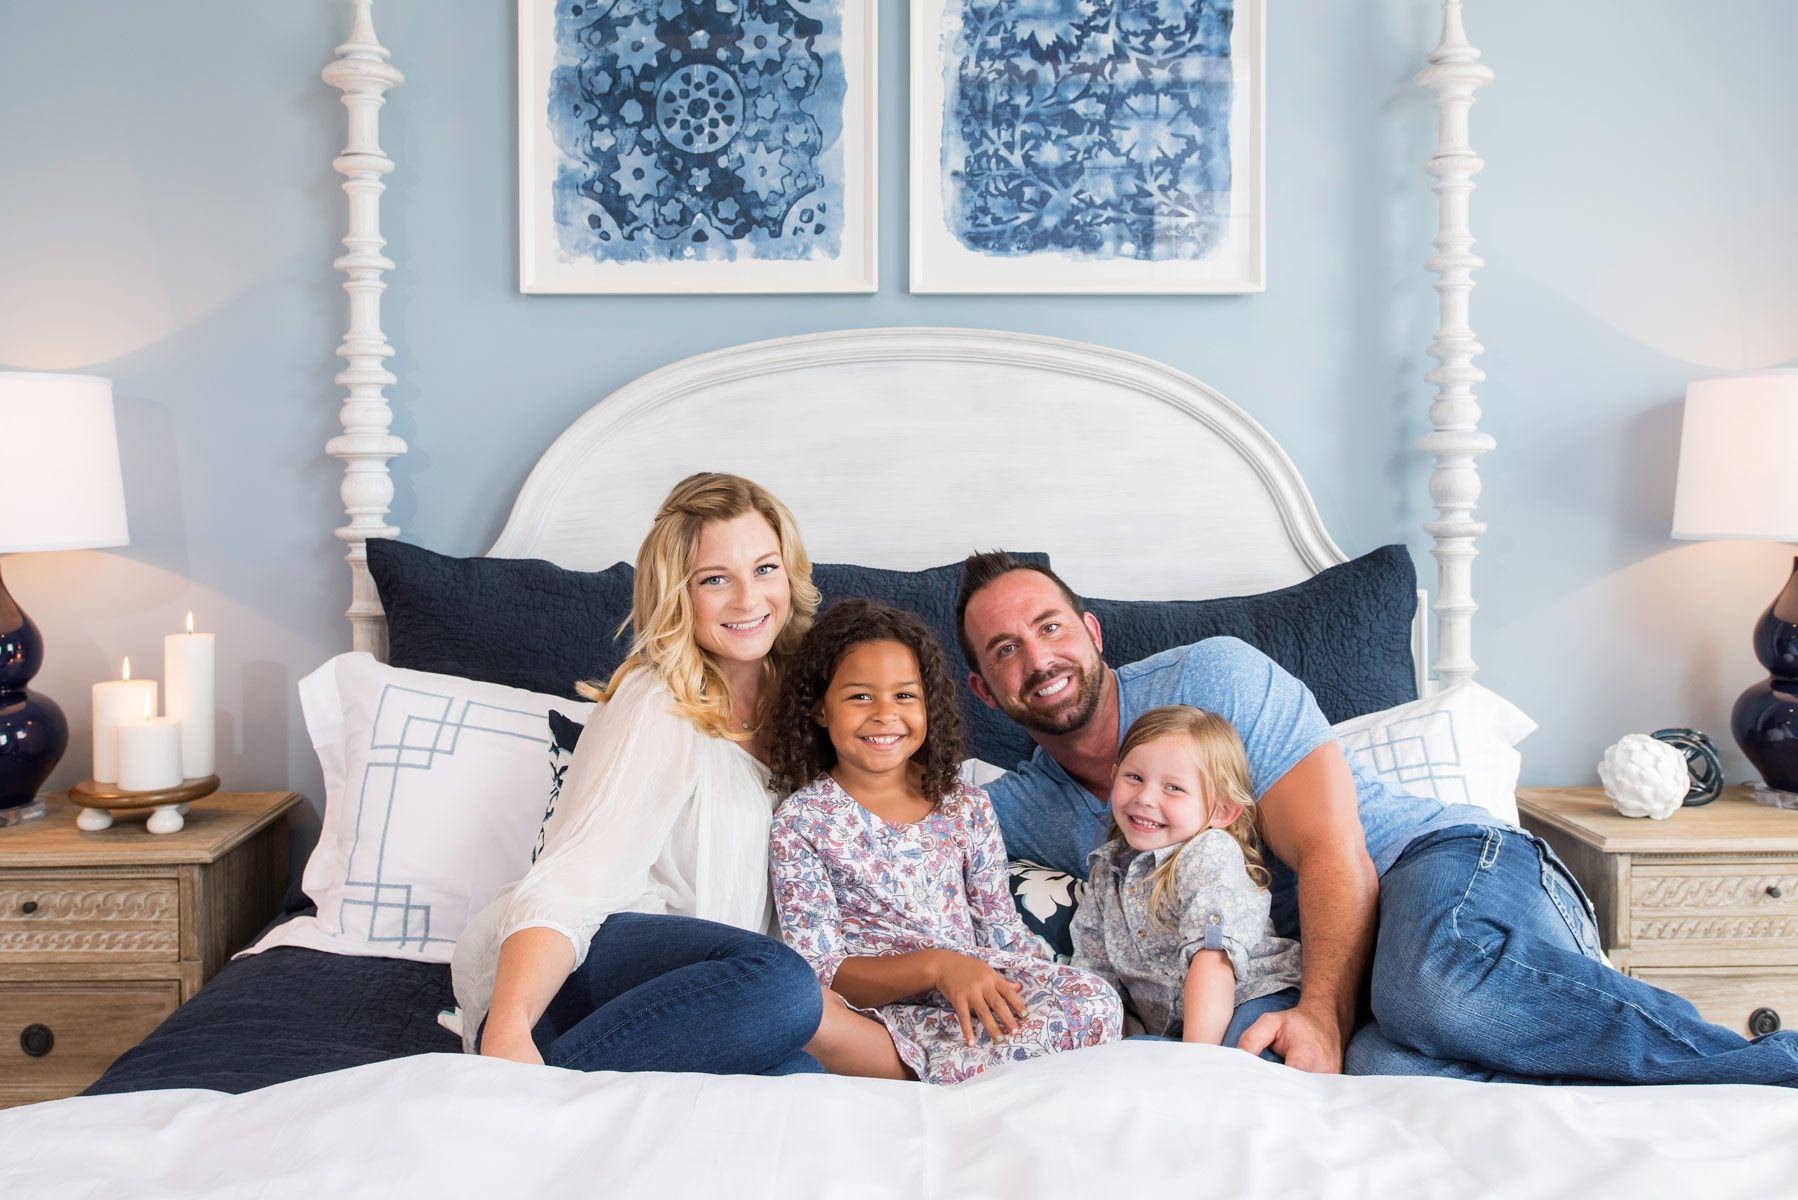 Family portrait in bedroom